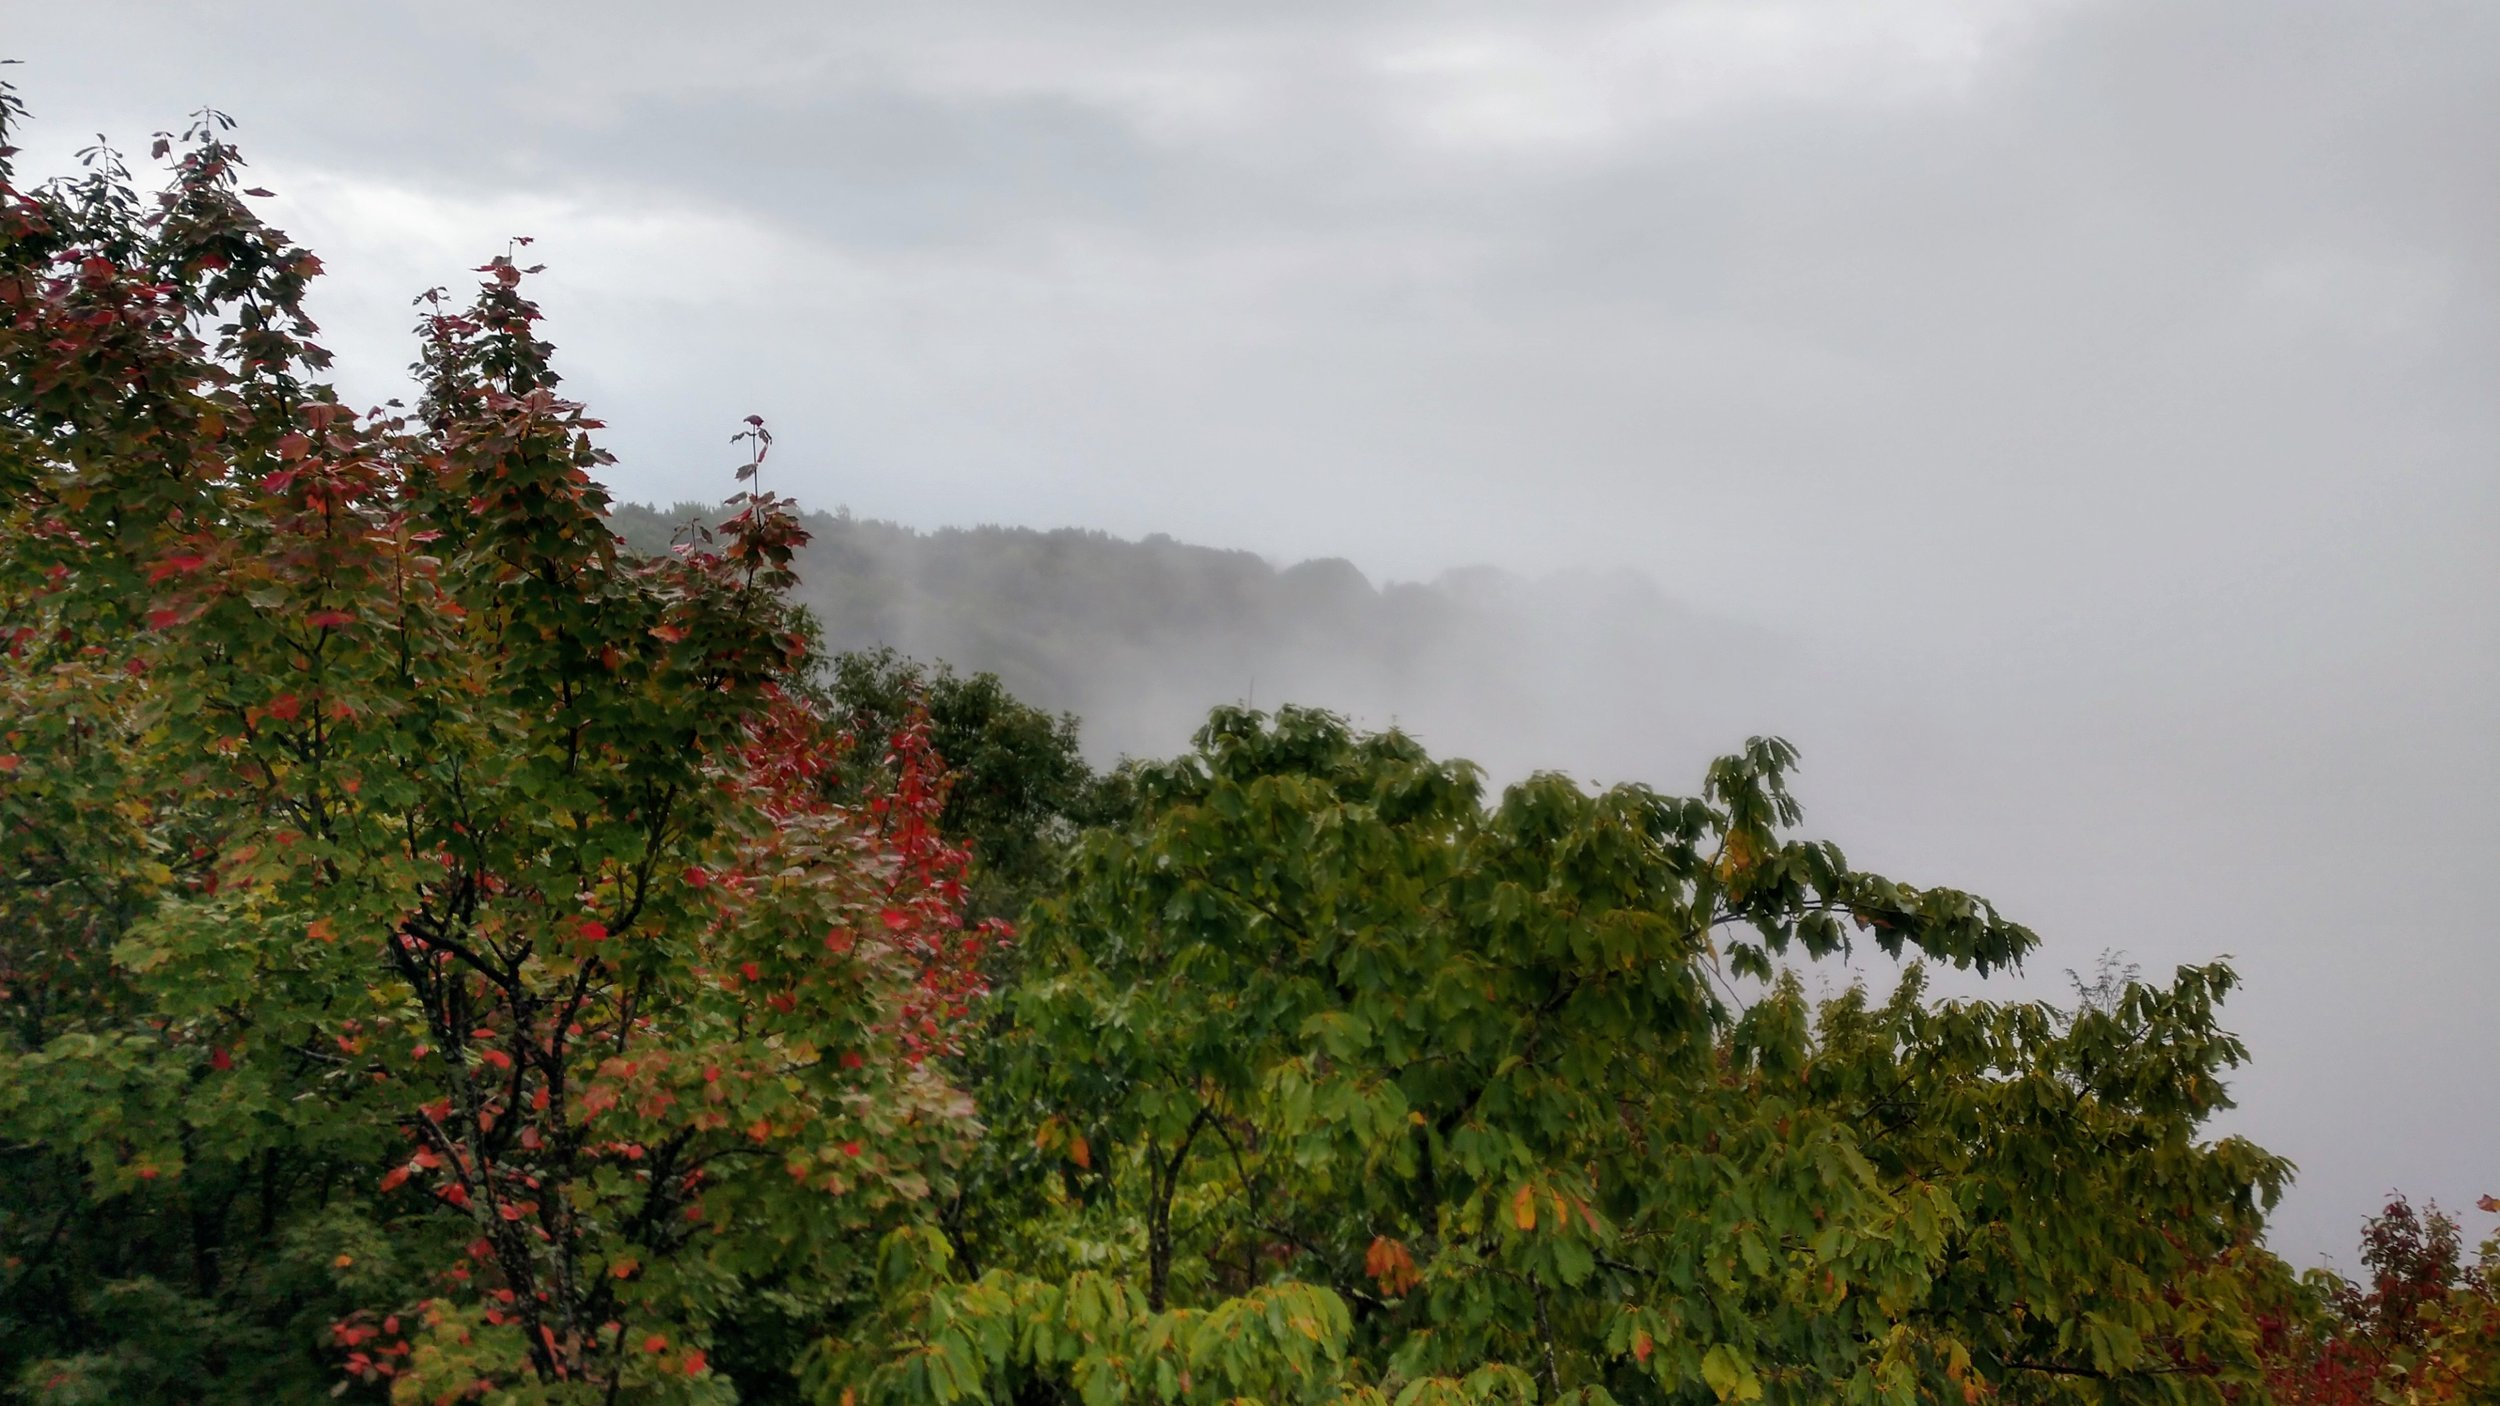 Afternoon fog at High Knob above Norton, Virginia